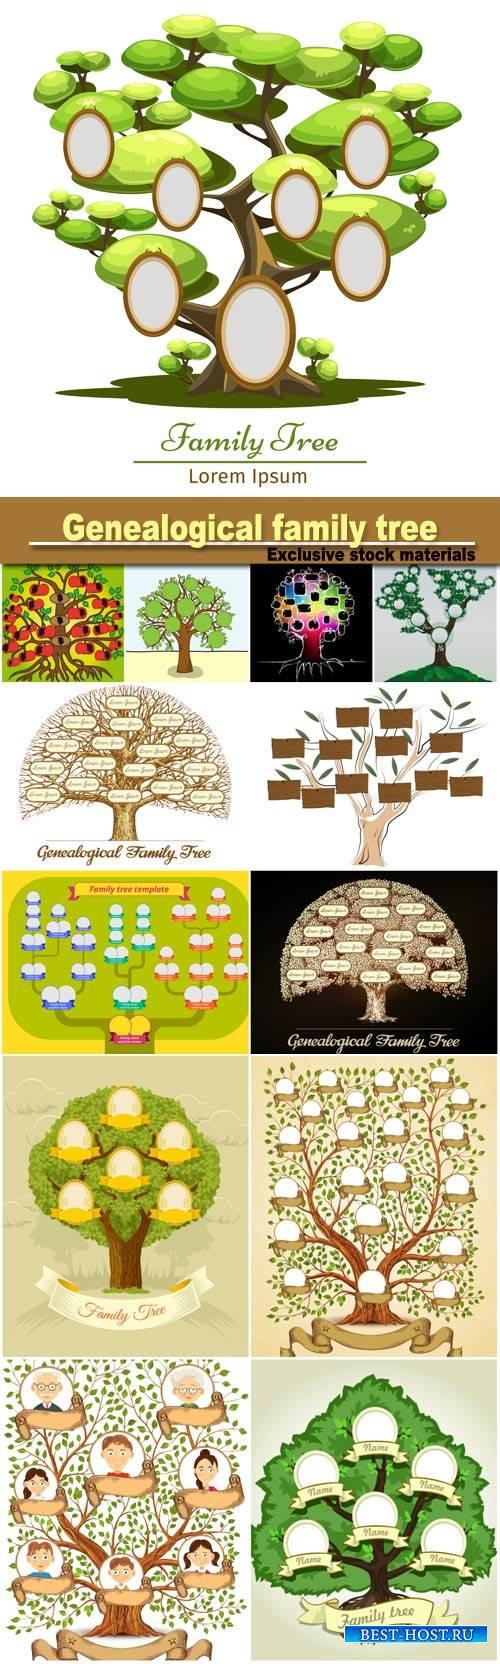 Vintage genealogical family tree, hand drawn sketch vector illustration